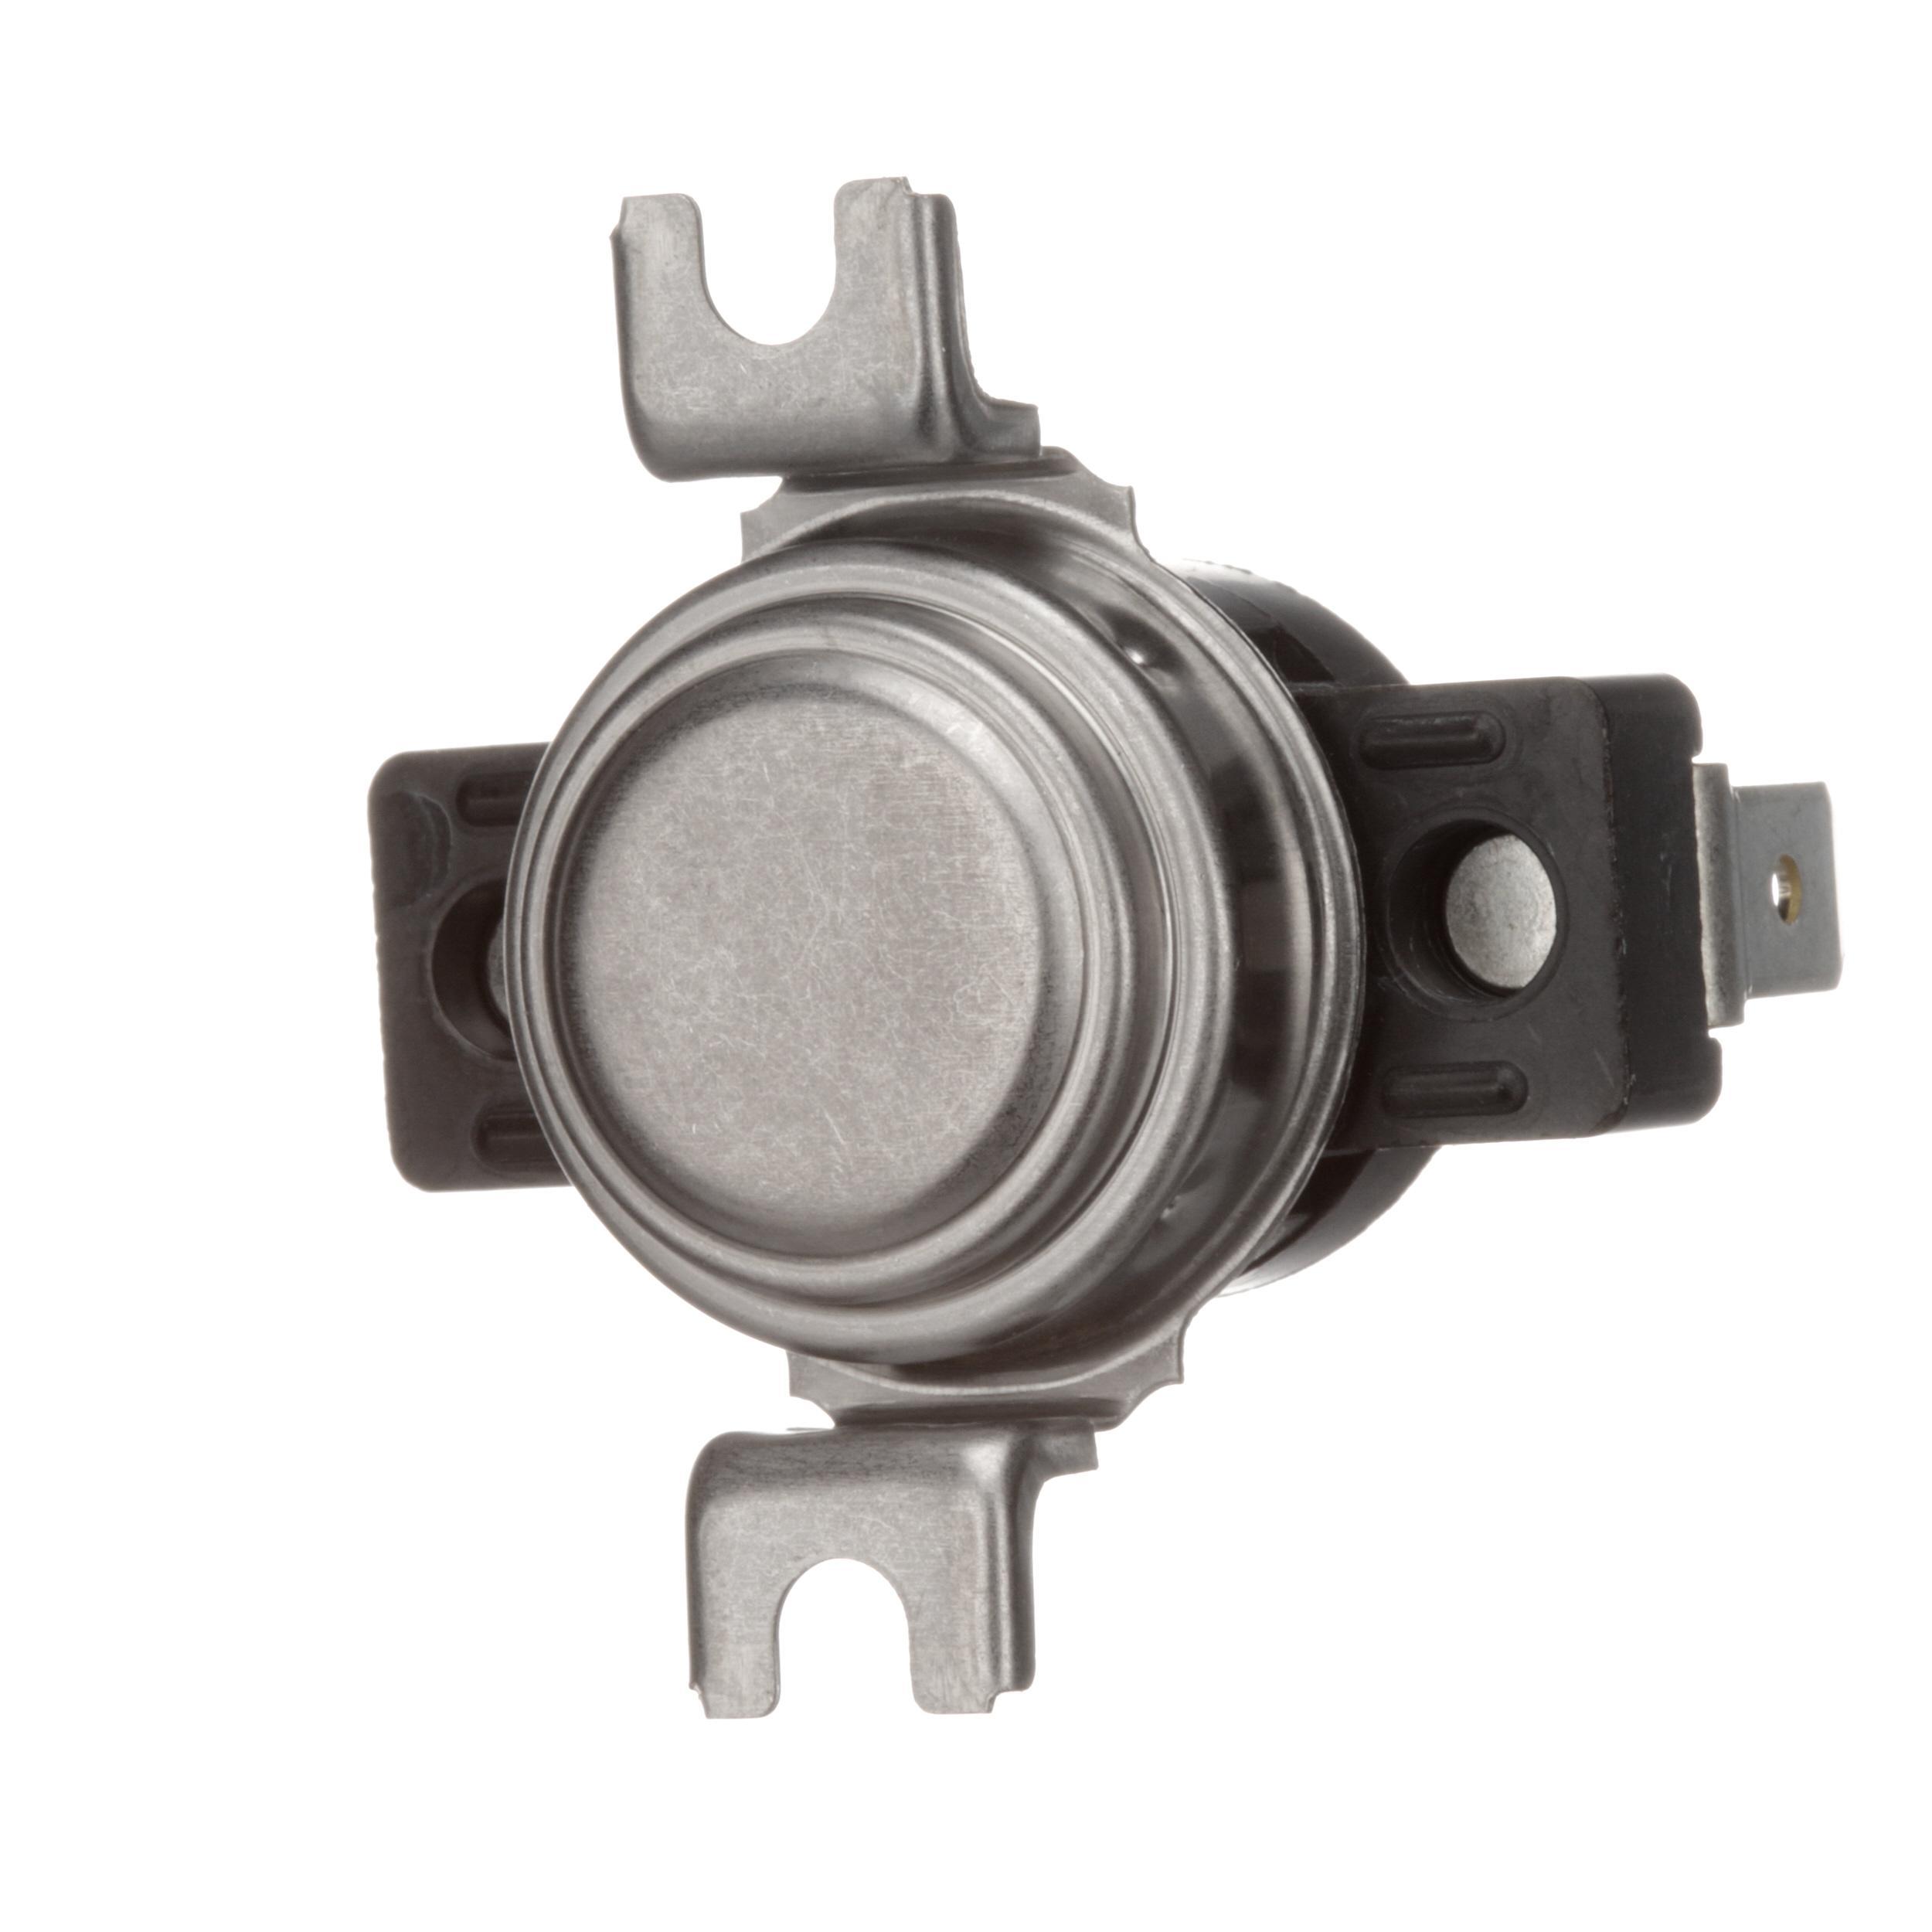 Air Ventilator Switch : Cres cor vent fan switch part